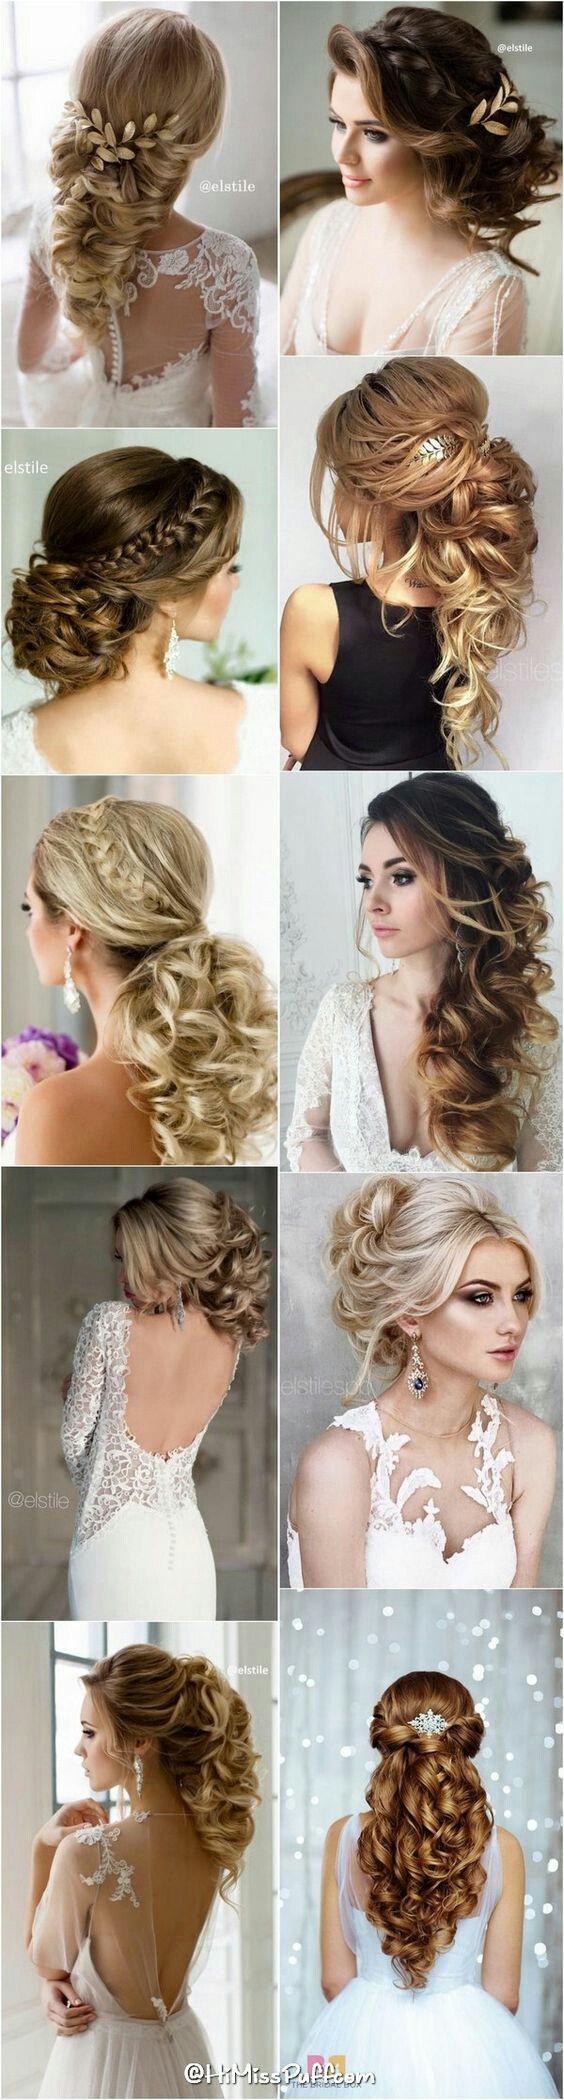 fairytale princess chic wedding hairstyles | ~weddings